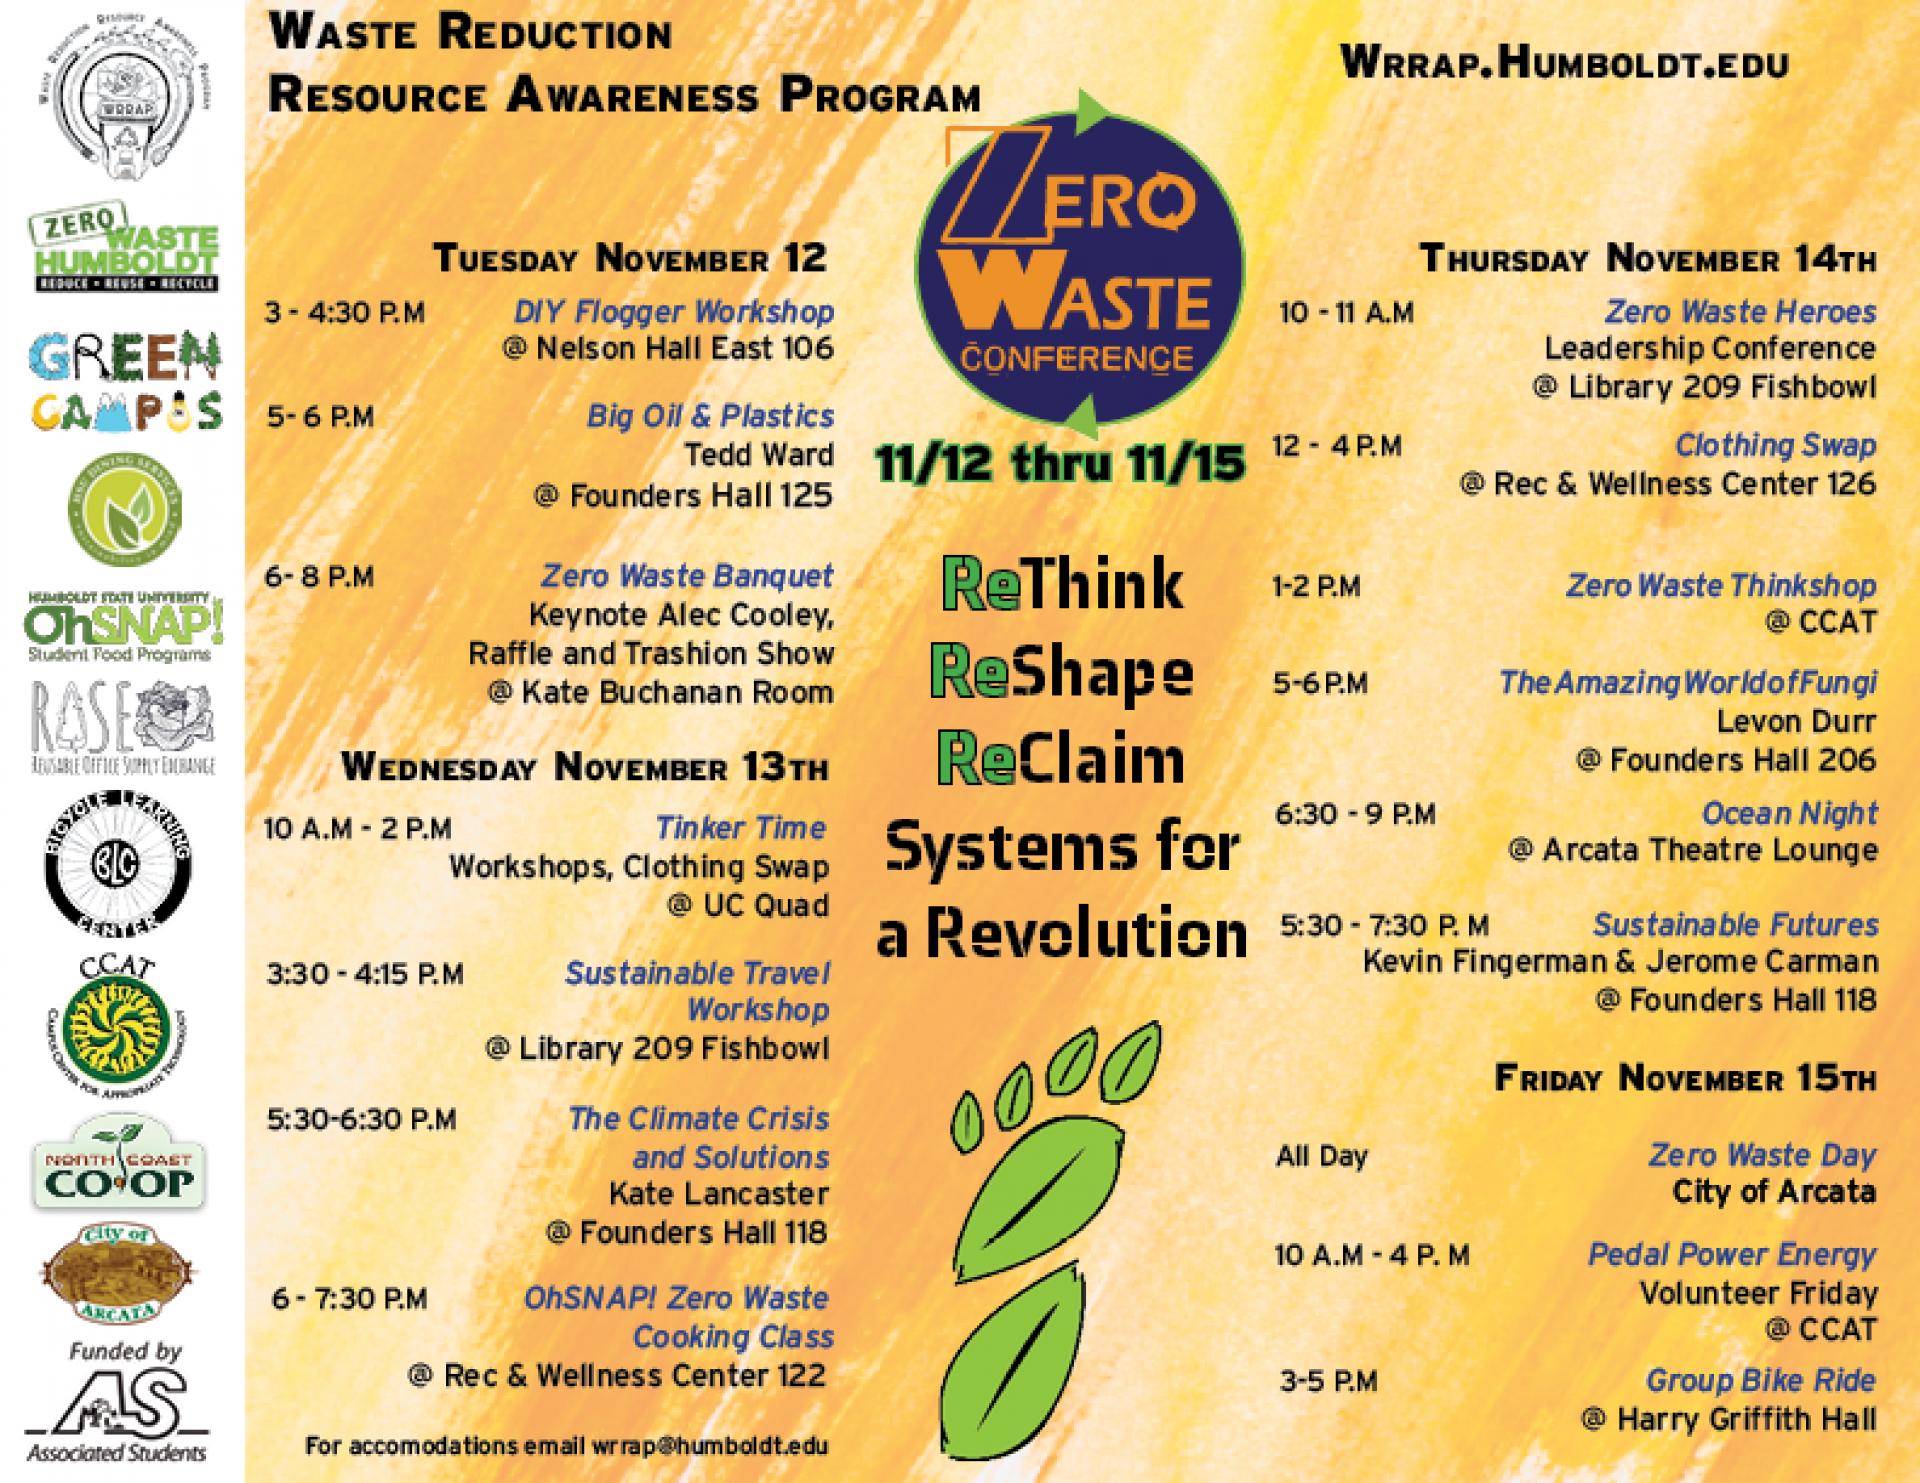 WRAPP's Zero Waste Conference 2019 flyer.